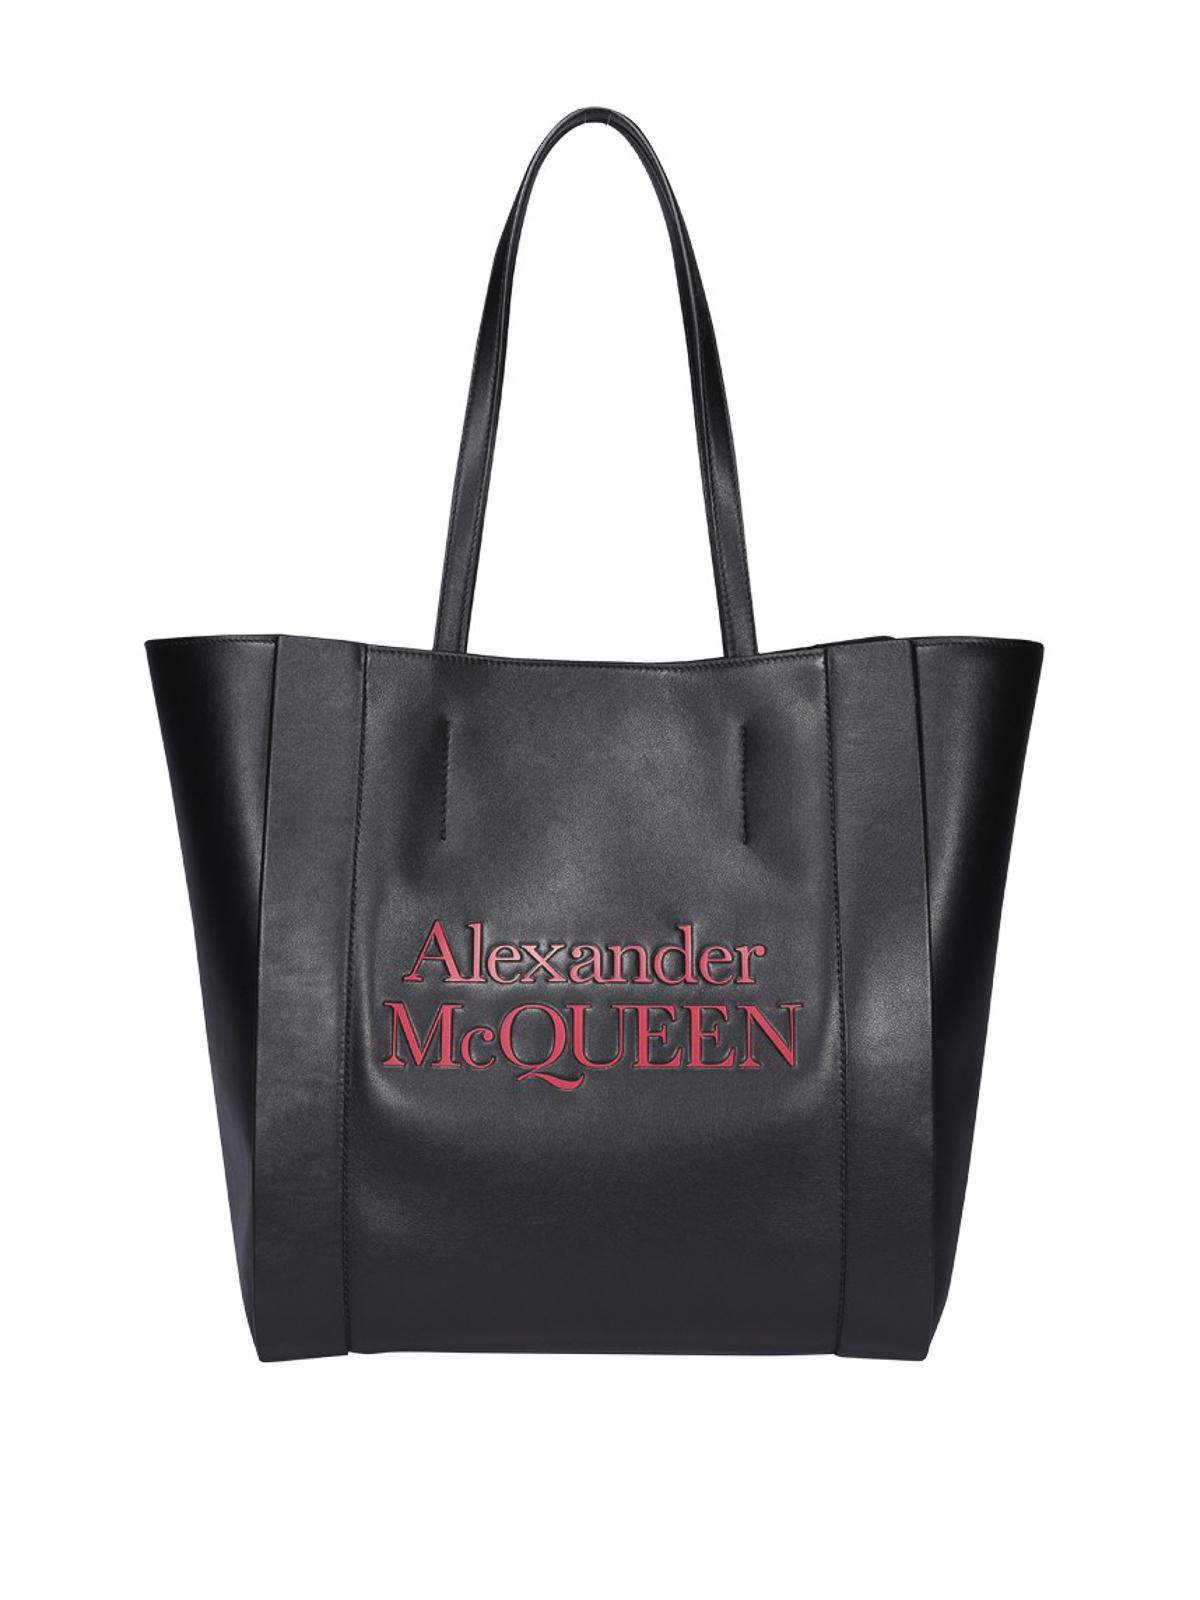 Alexander Mcqueen Signature Tote In Black